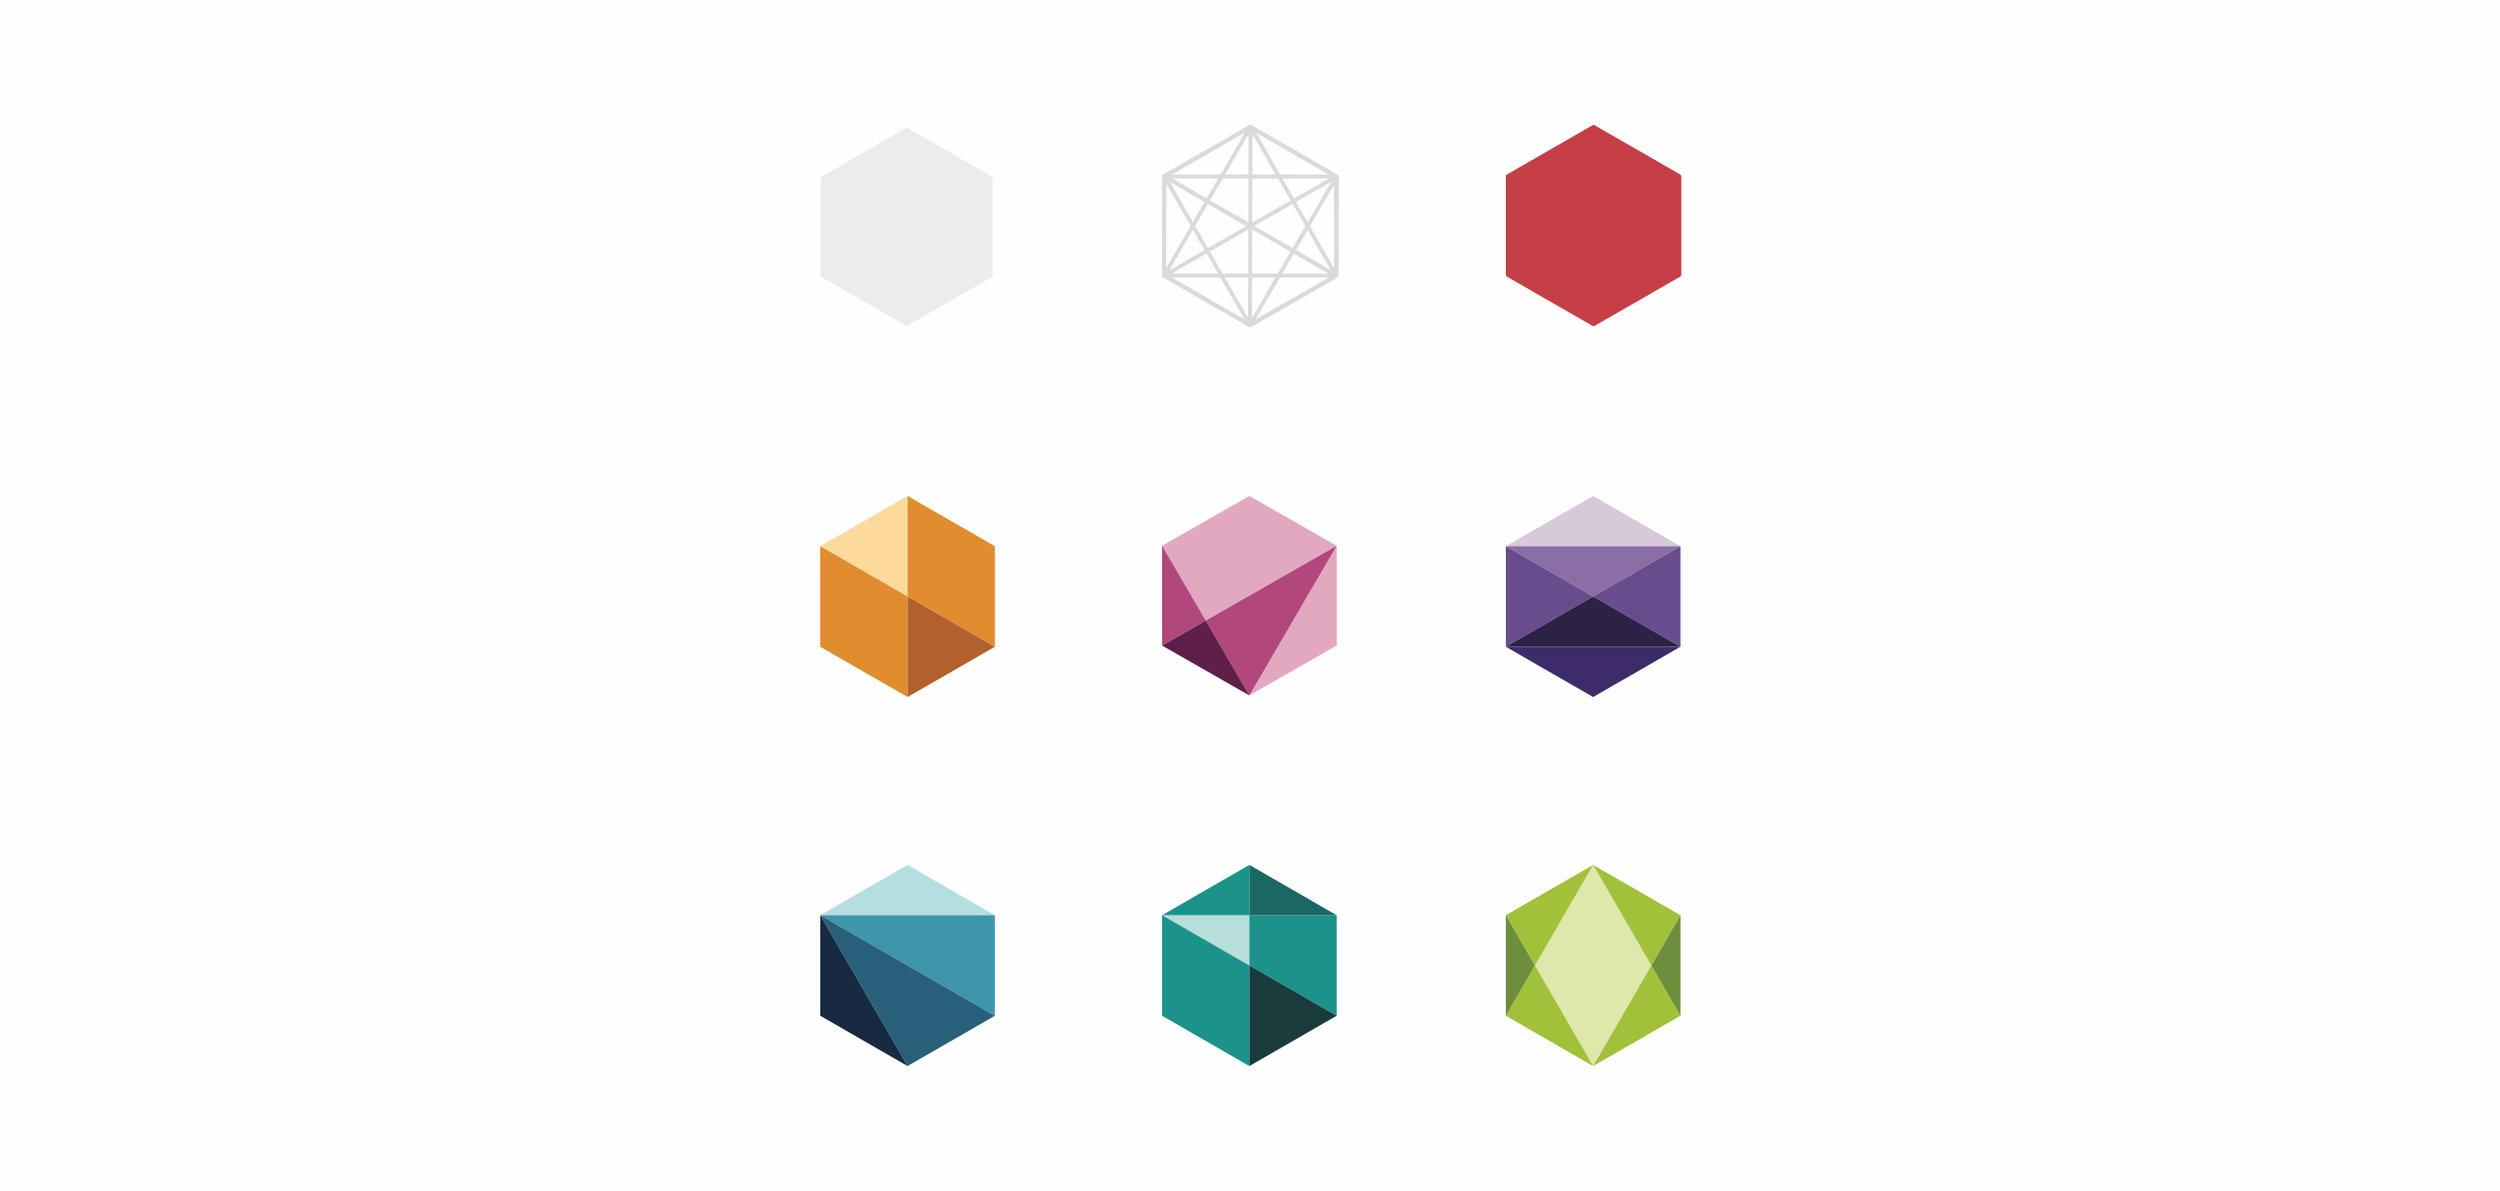 emds_brand-patterns-05@2x.jpg